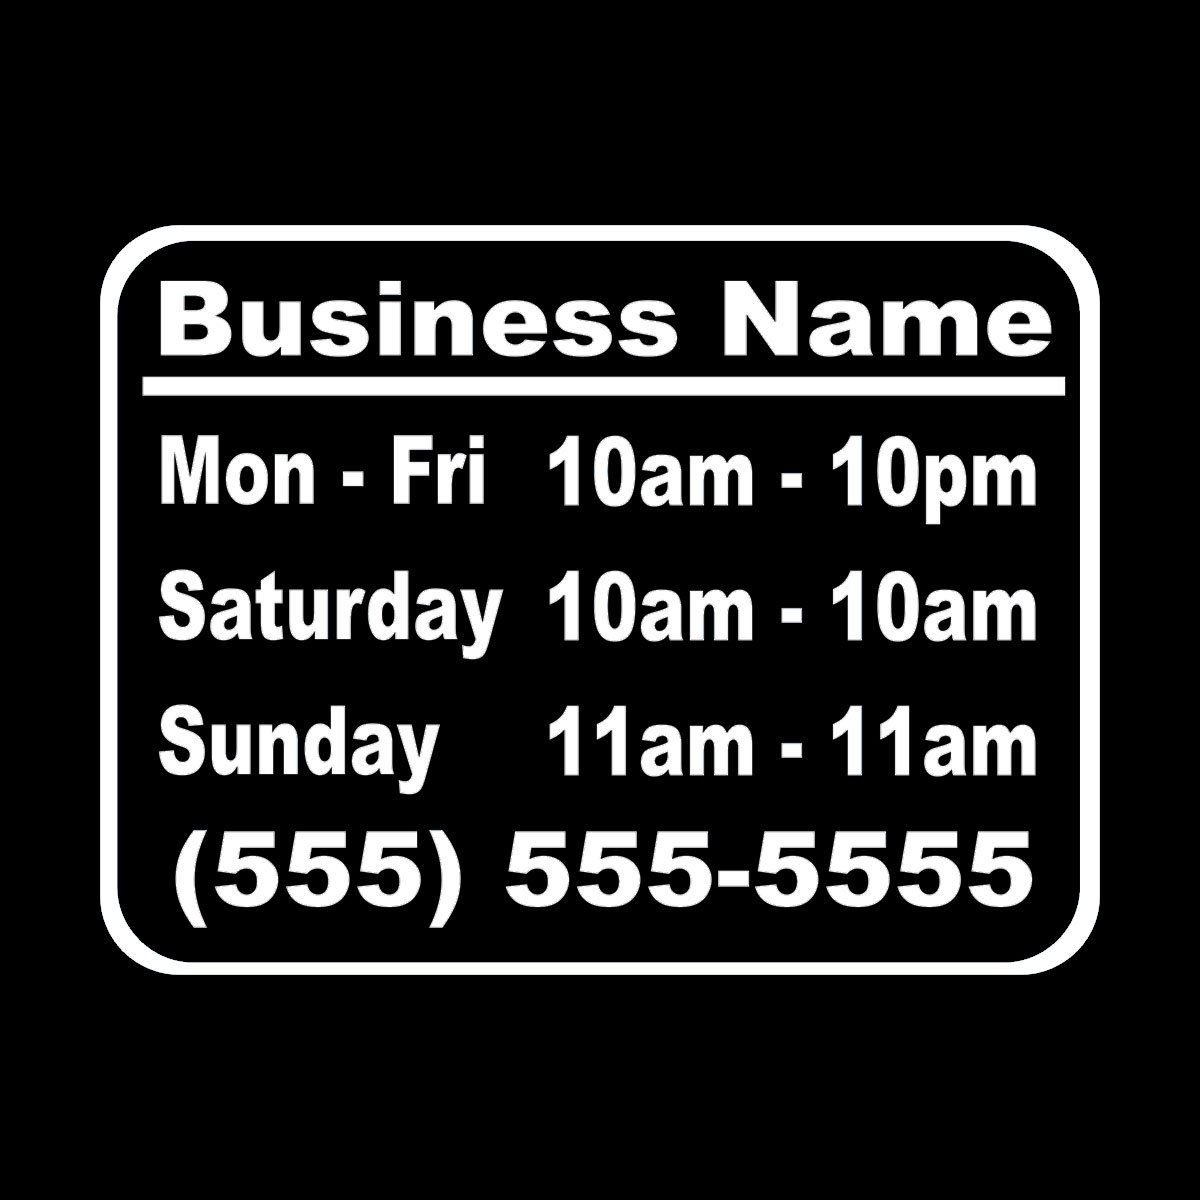 Wild Dingos LLC Business Hours Style 1 Size 10x13 Store Window Vinyl Decal Sticker White